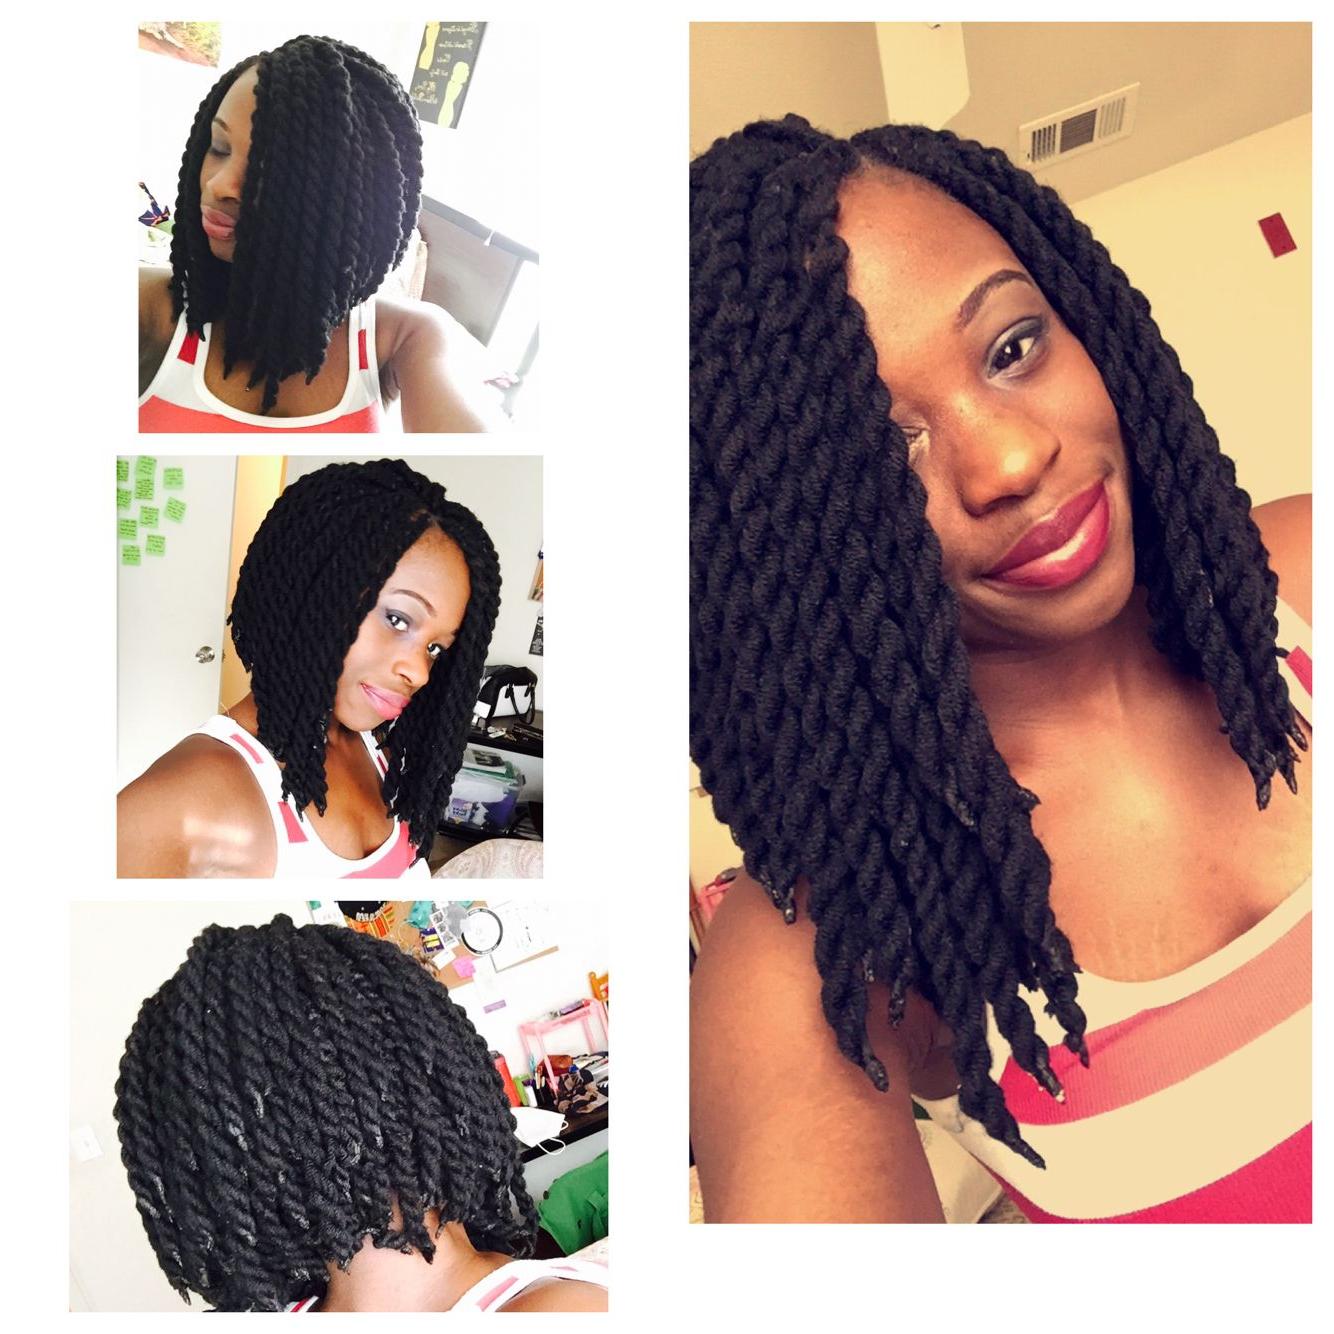 2019 Long Black Yarn Twists Hairstyles With Yarn Twist Bob (View 11 of 20)